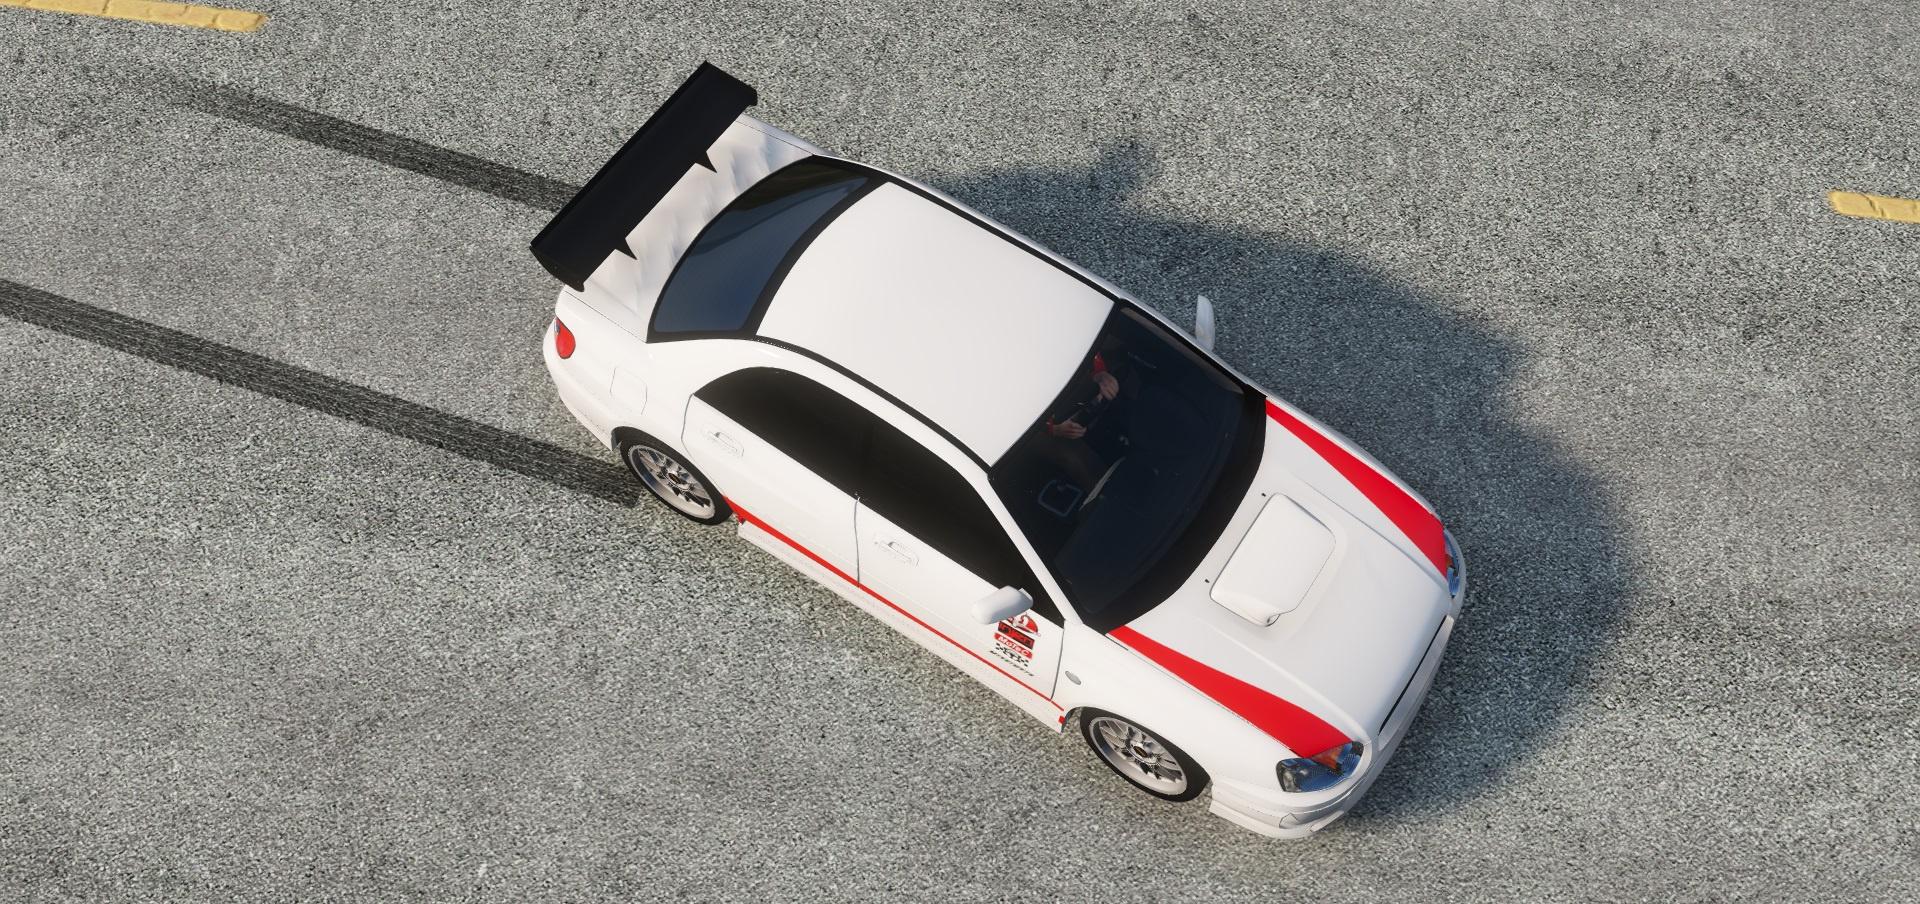 Subaru Impreza Wrx Sti 2004 Born To Race Livery Gta5 Modscom Name Of The In E6a676 Btr6